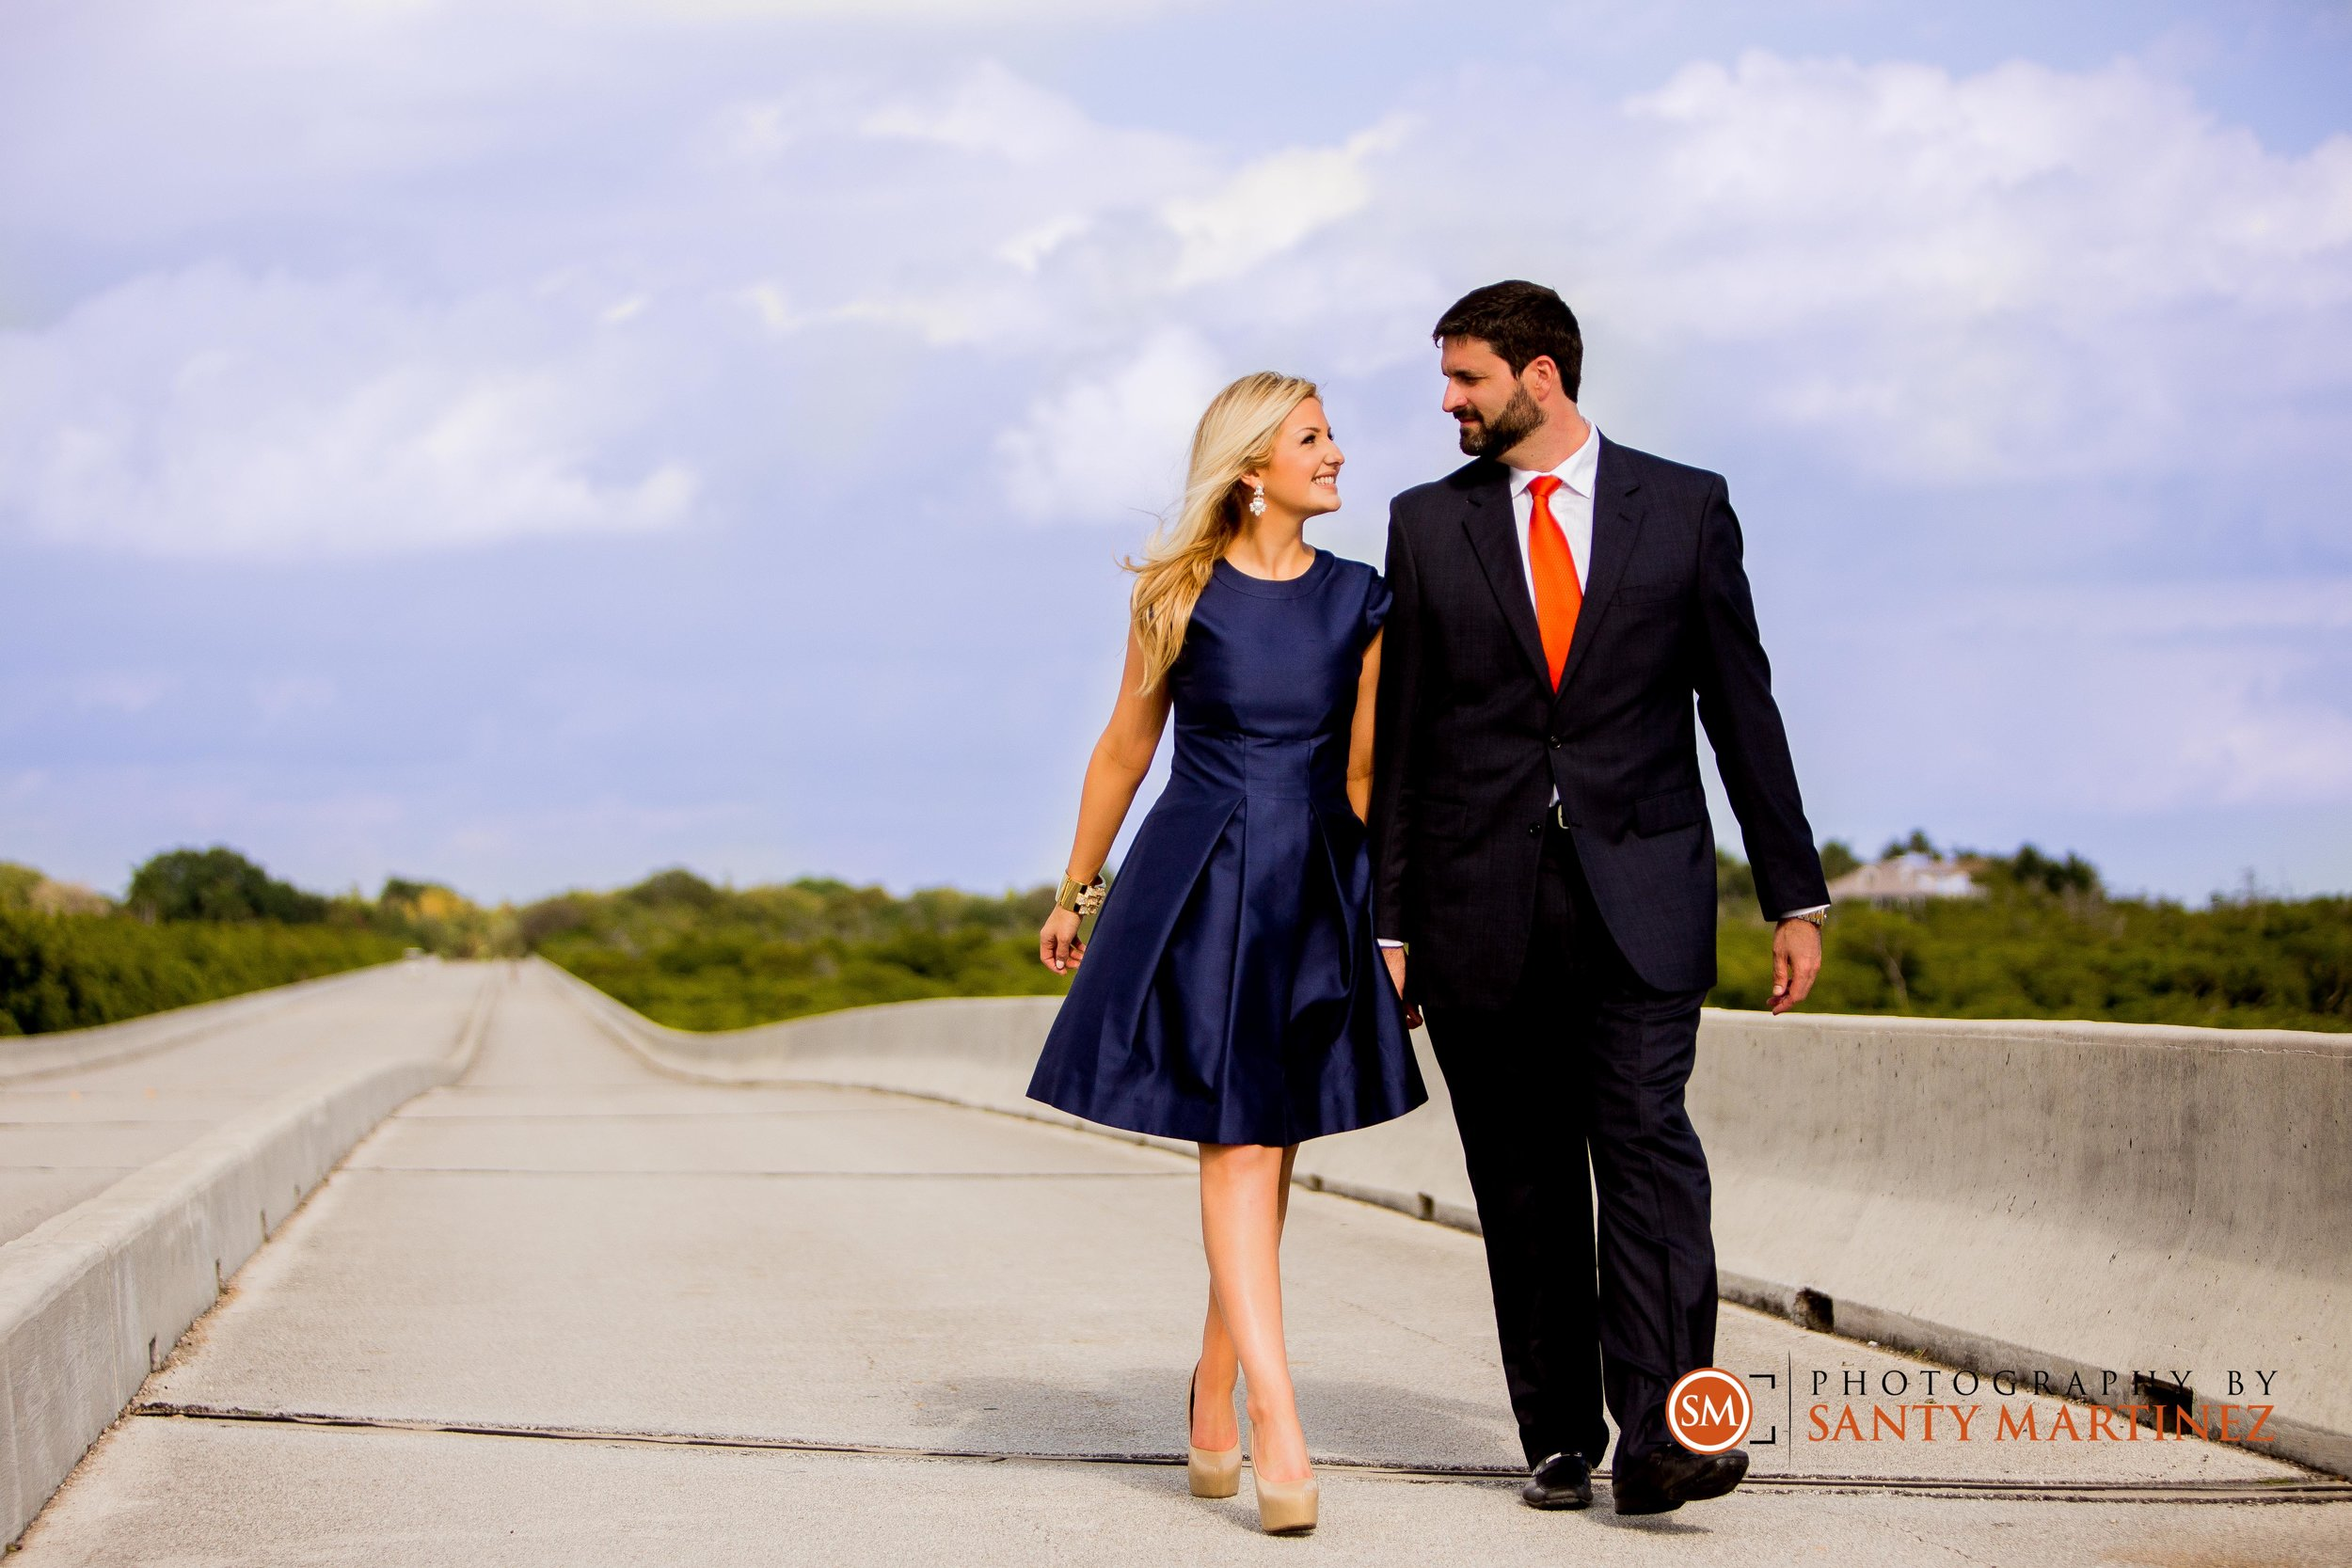 Photography by Santy Martinez - Miami Wedding Photographer-6.jpg